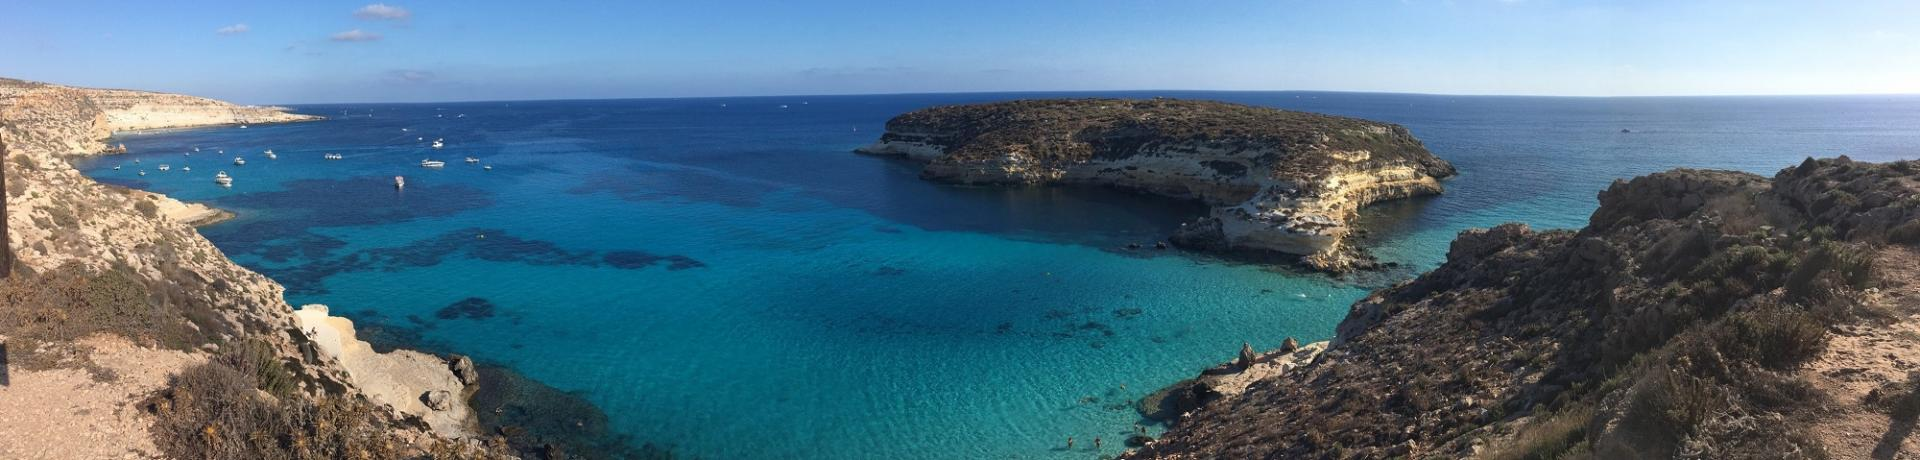 Italien-Lampedusa-Coniglie_GI-768100177.jpg